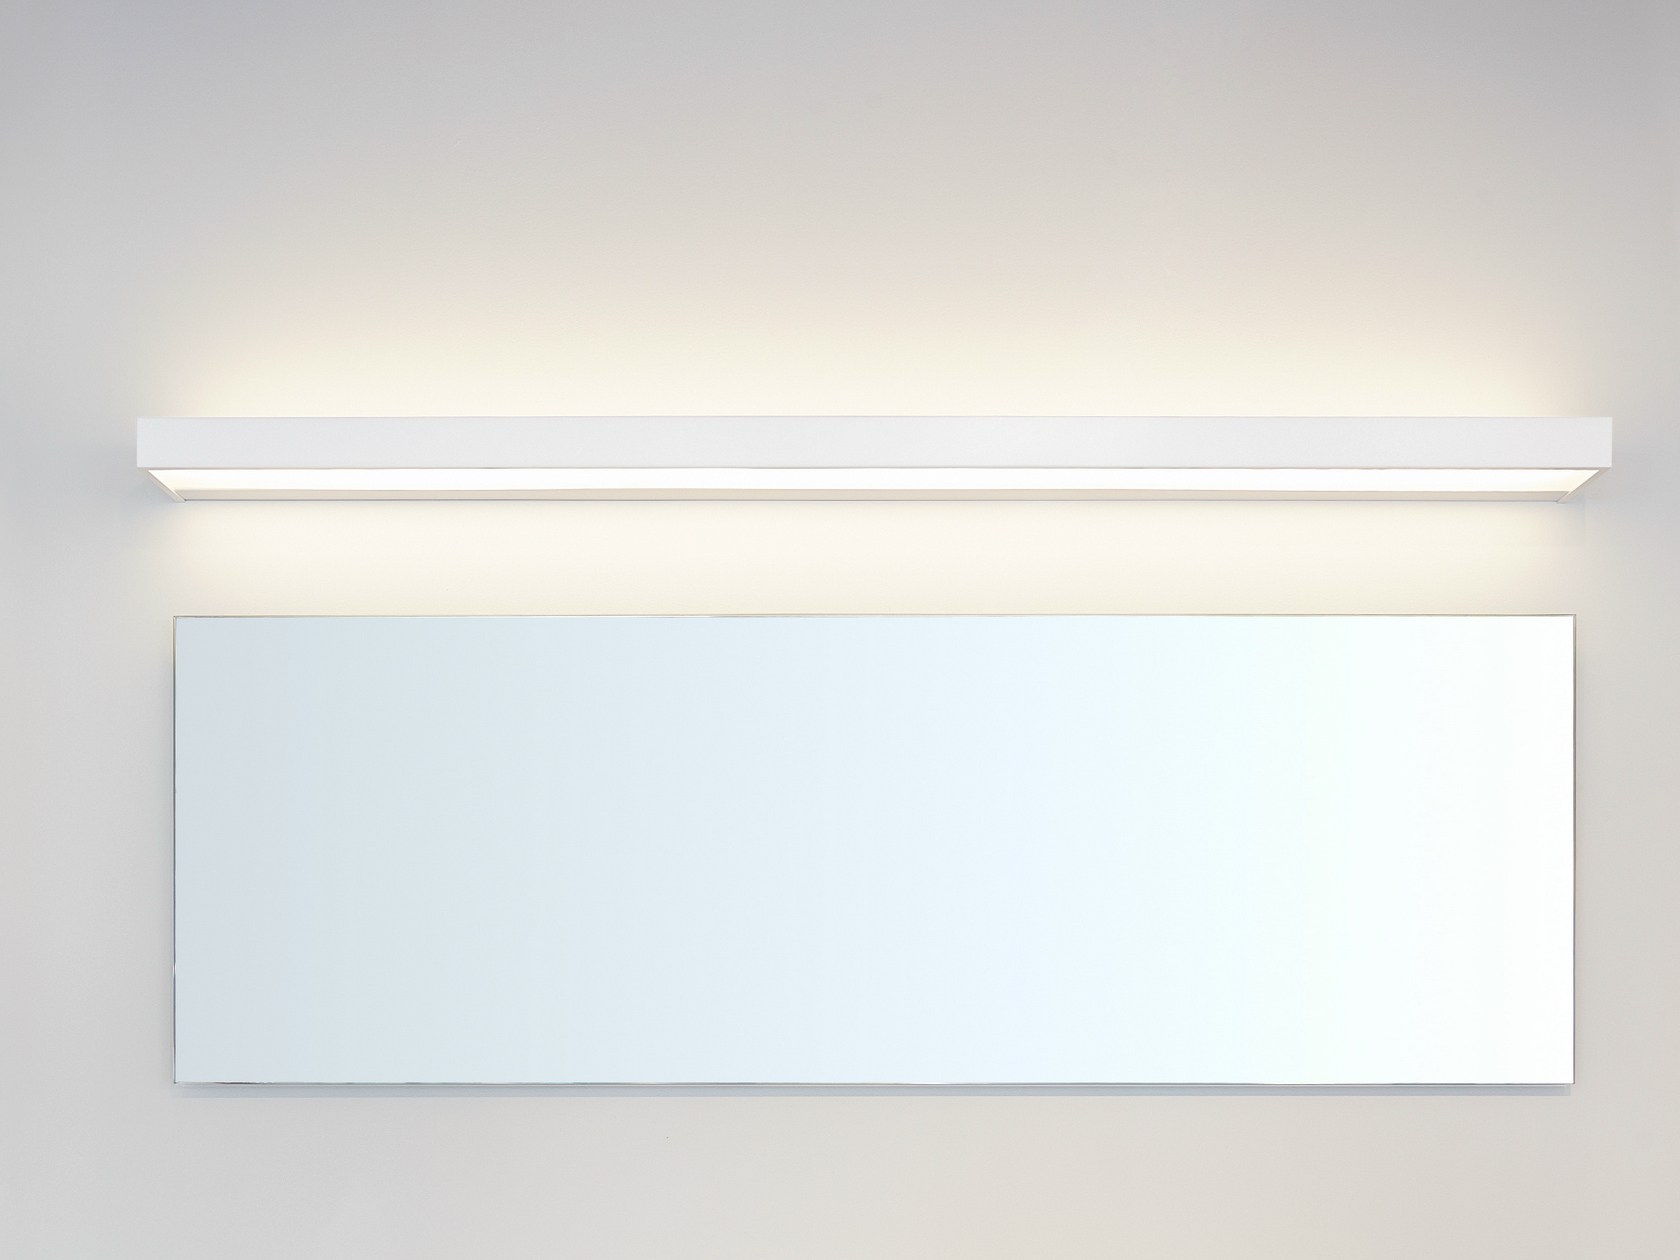 led spiegelleuchte box 150 led by decor walther. Black Bedroom Furniture Sets. Home Design Ideas